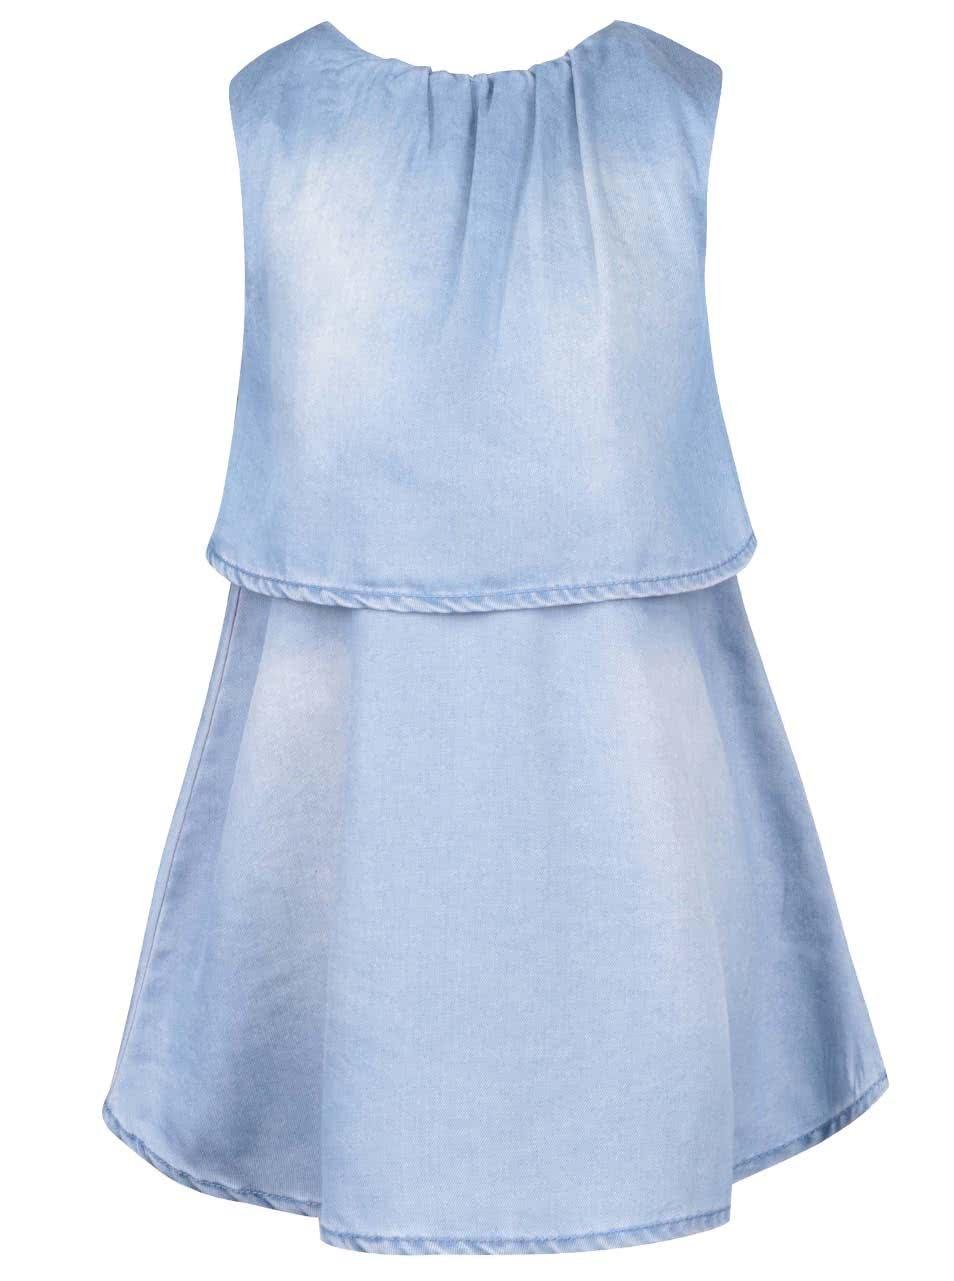 d42f56f41147 Modré dievčenské rifľové šaty name it Sisielga ...